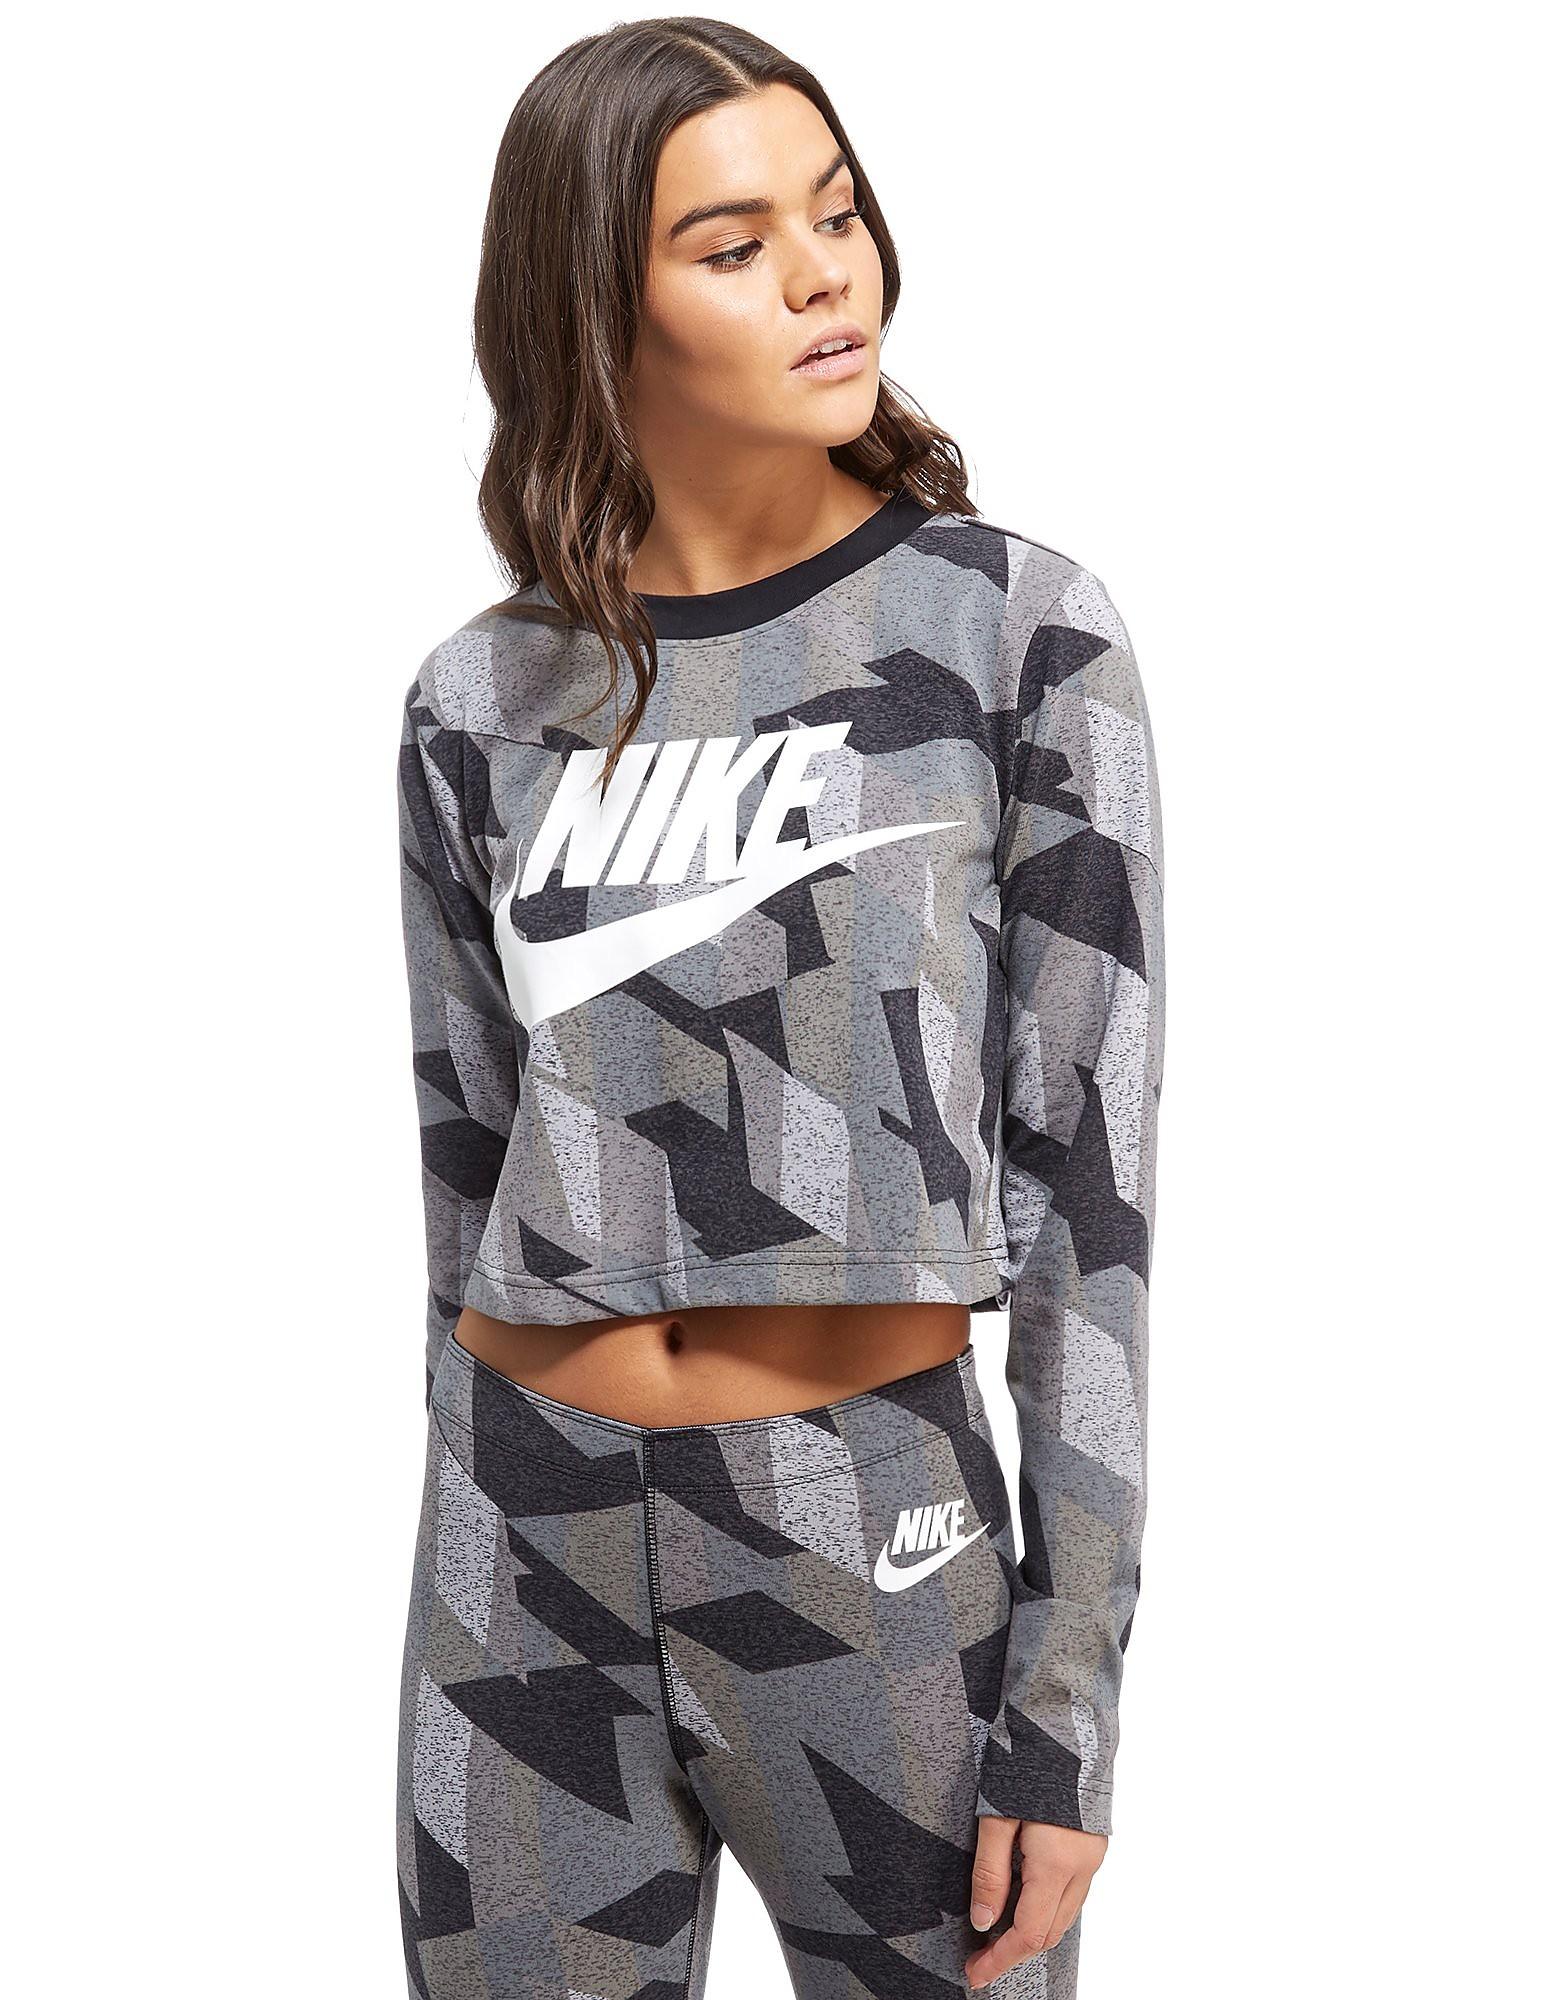 Nike Skyscraper All Over Print Crop T-Shirt